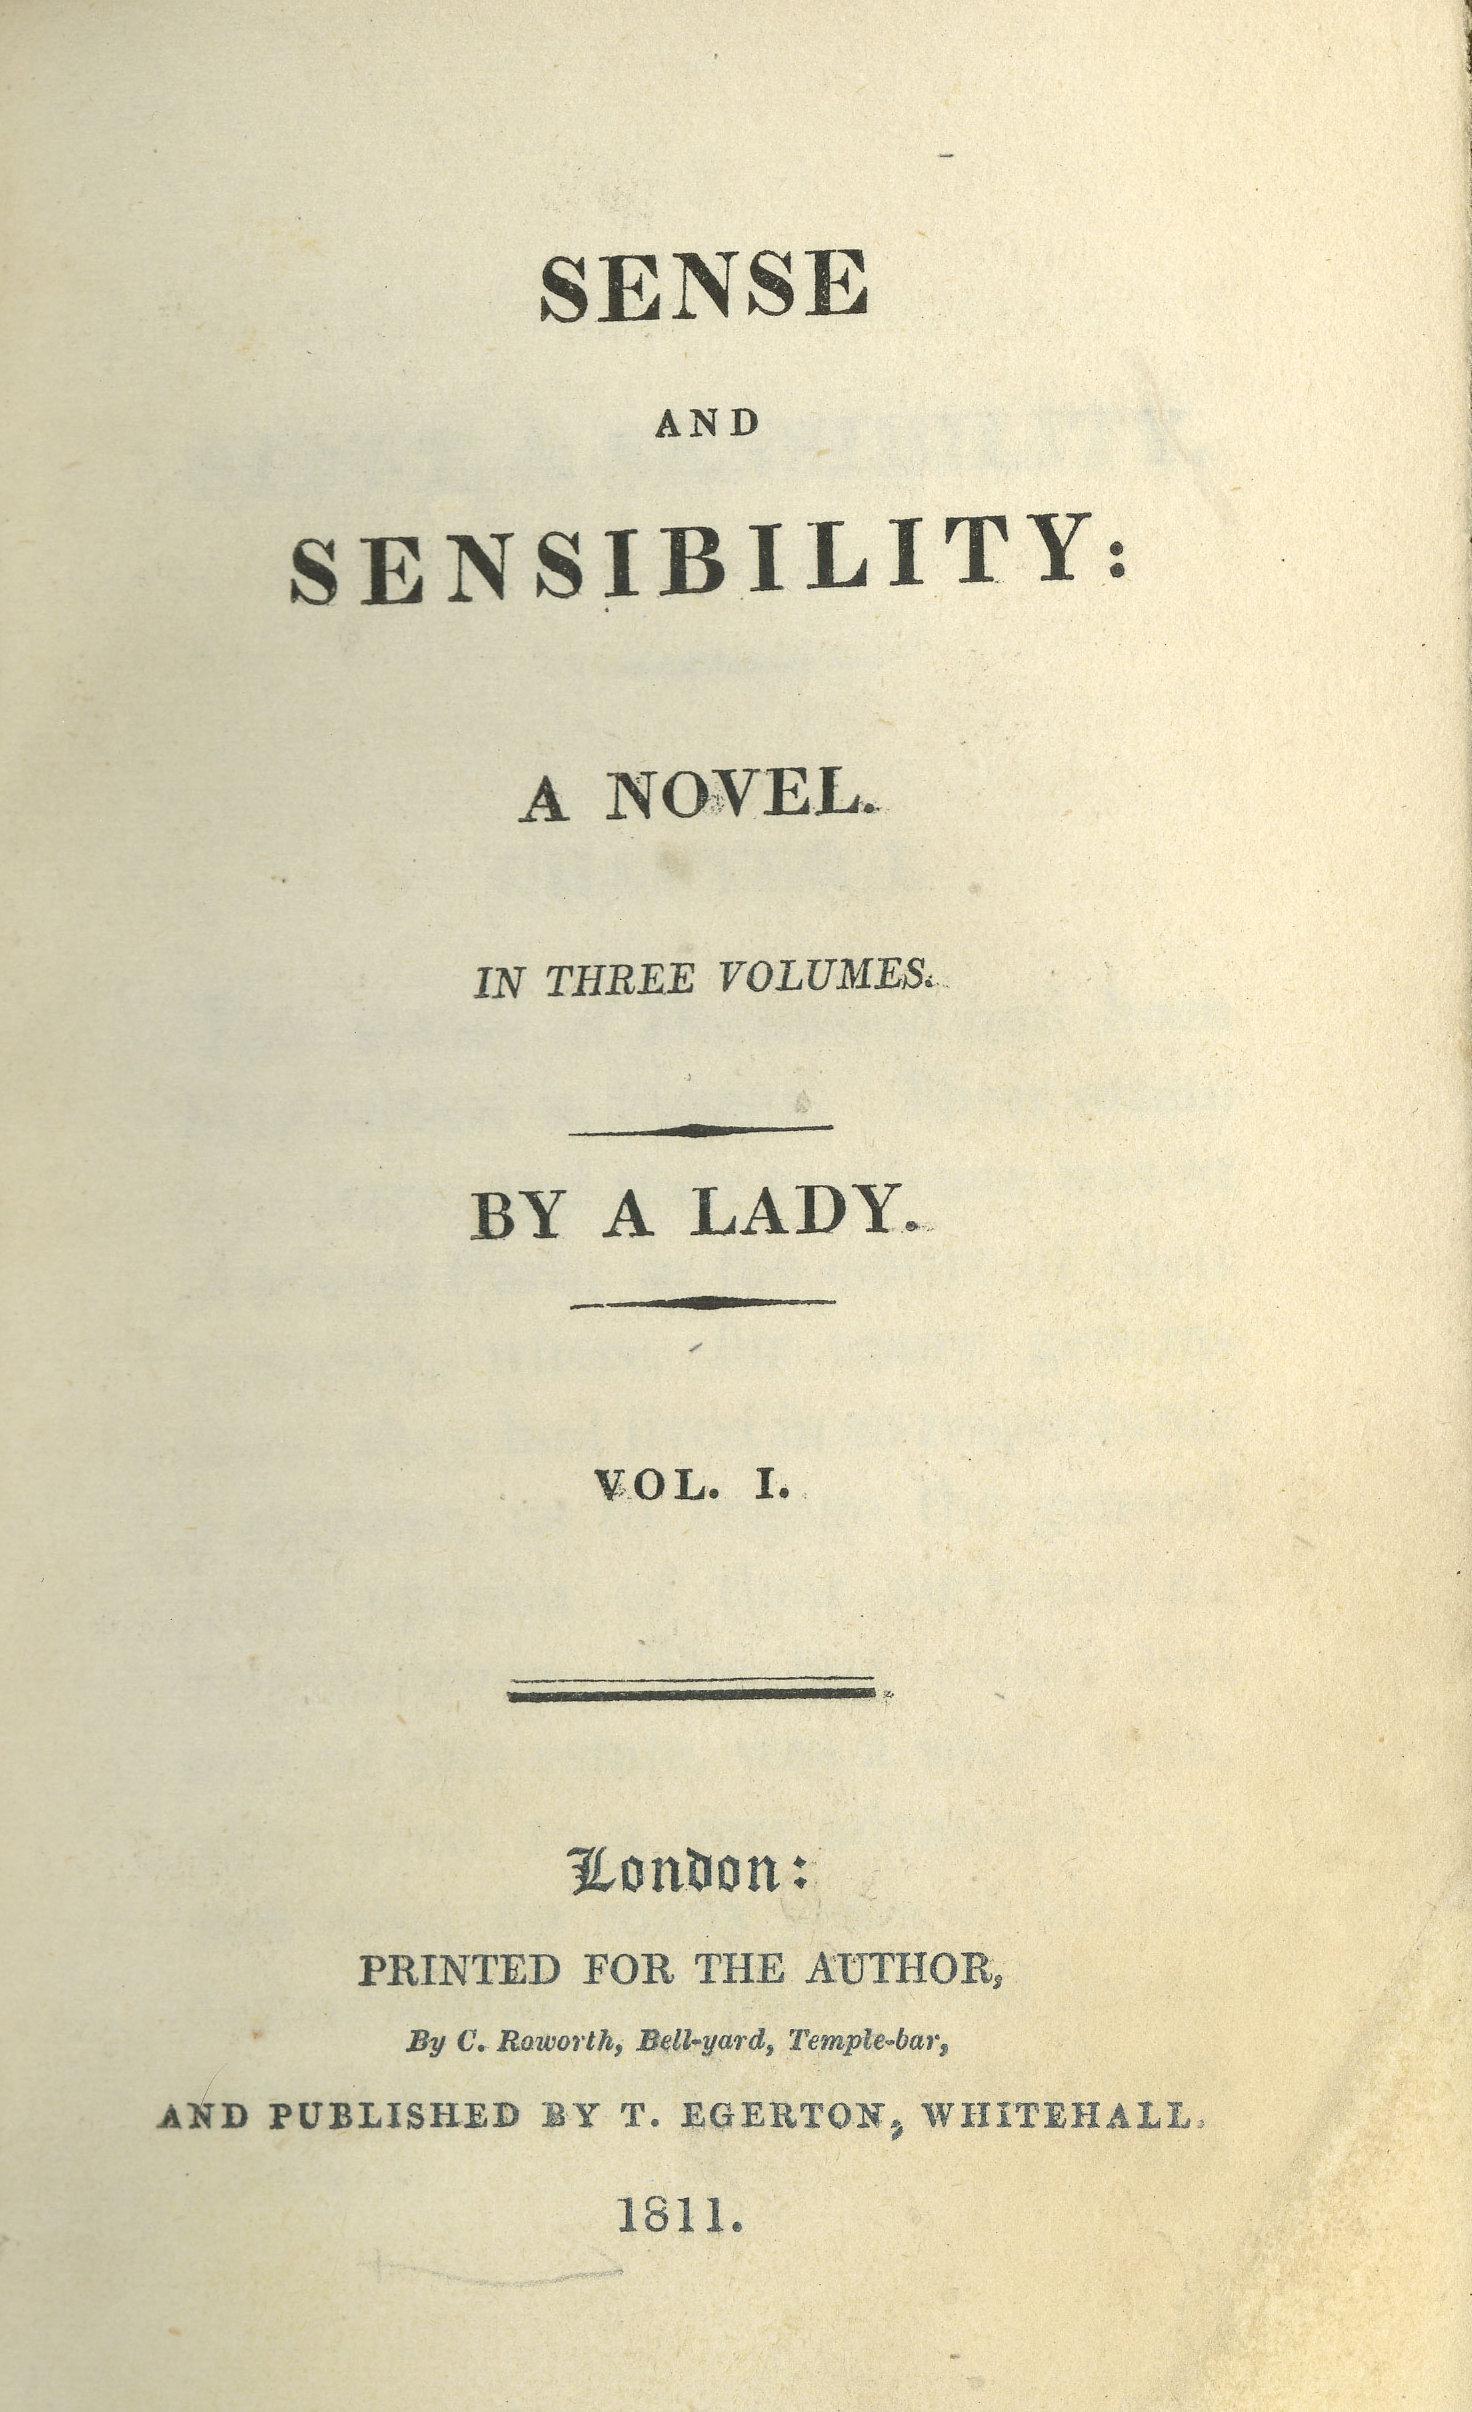 Sense and Sensibility cover